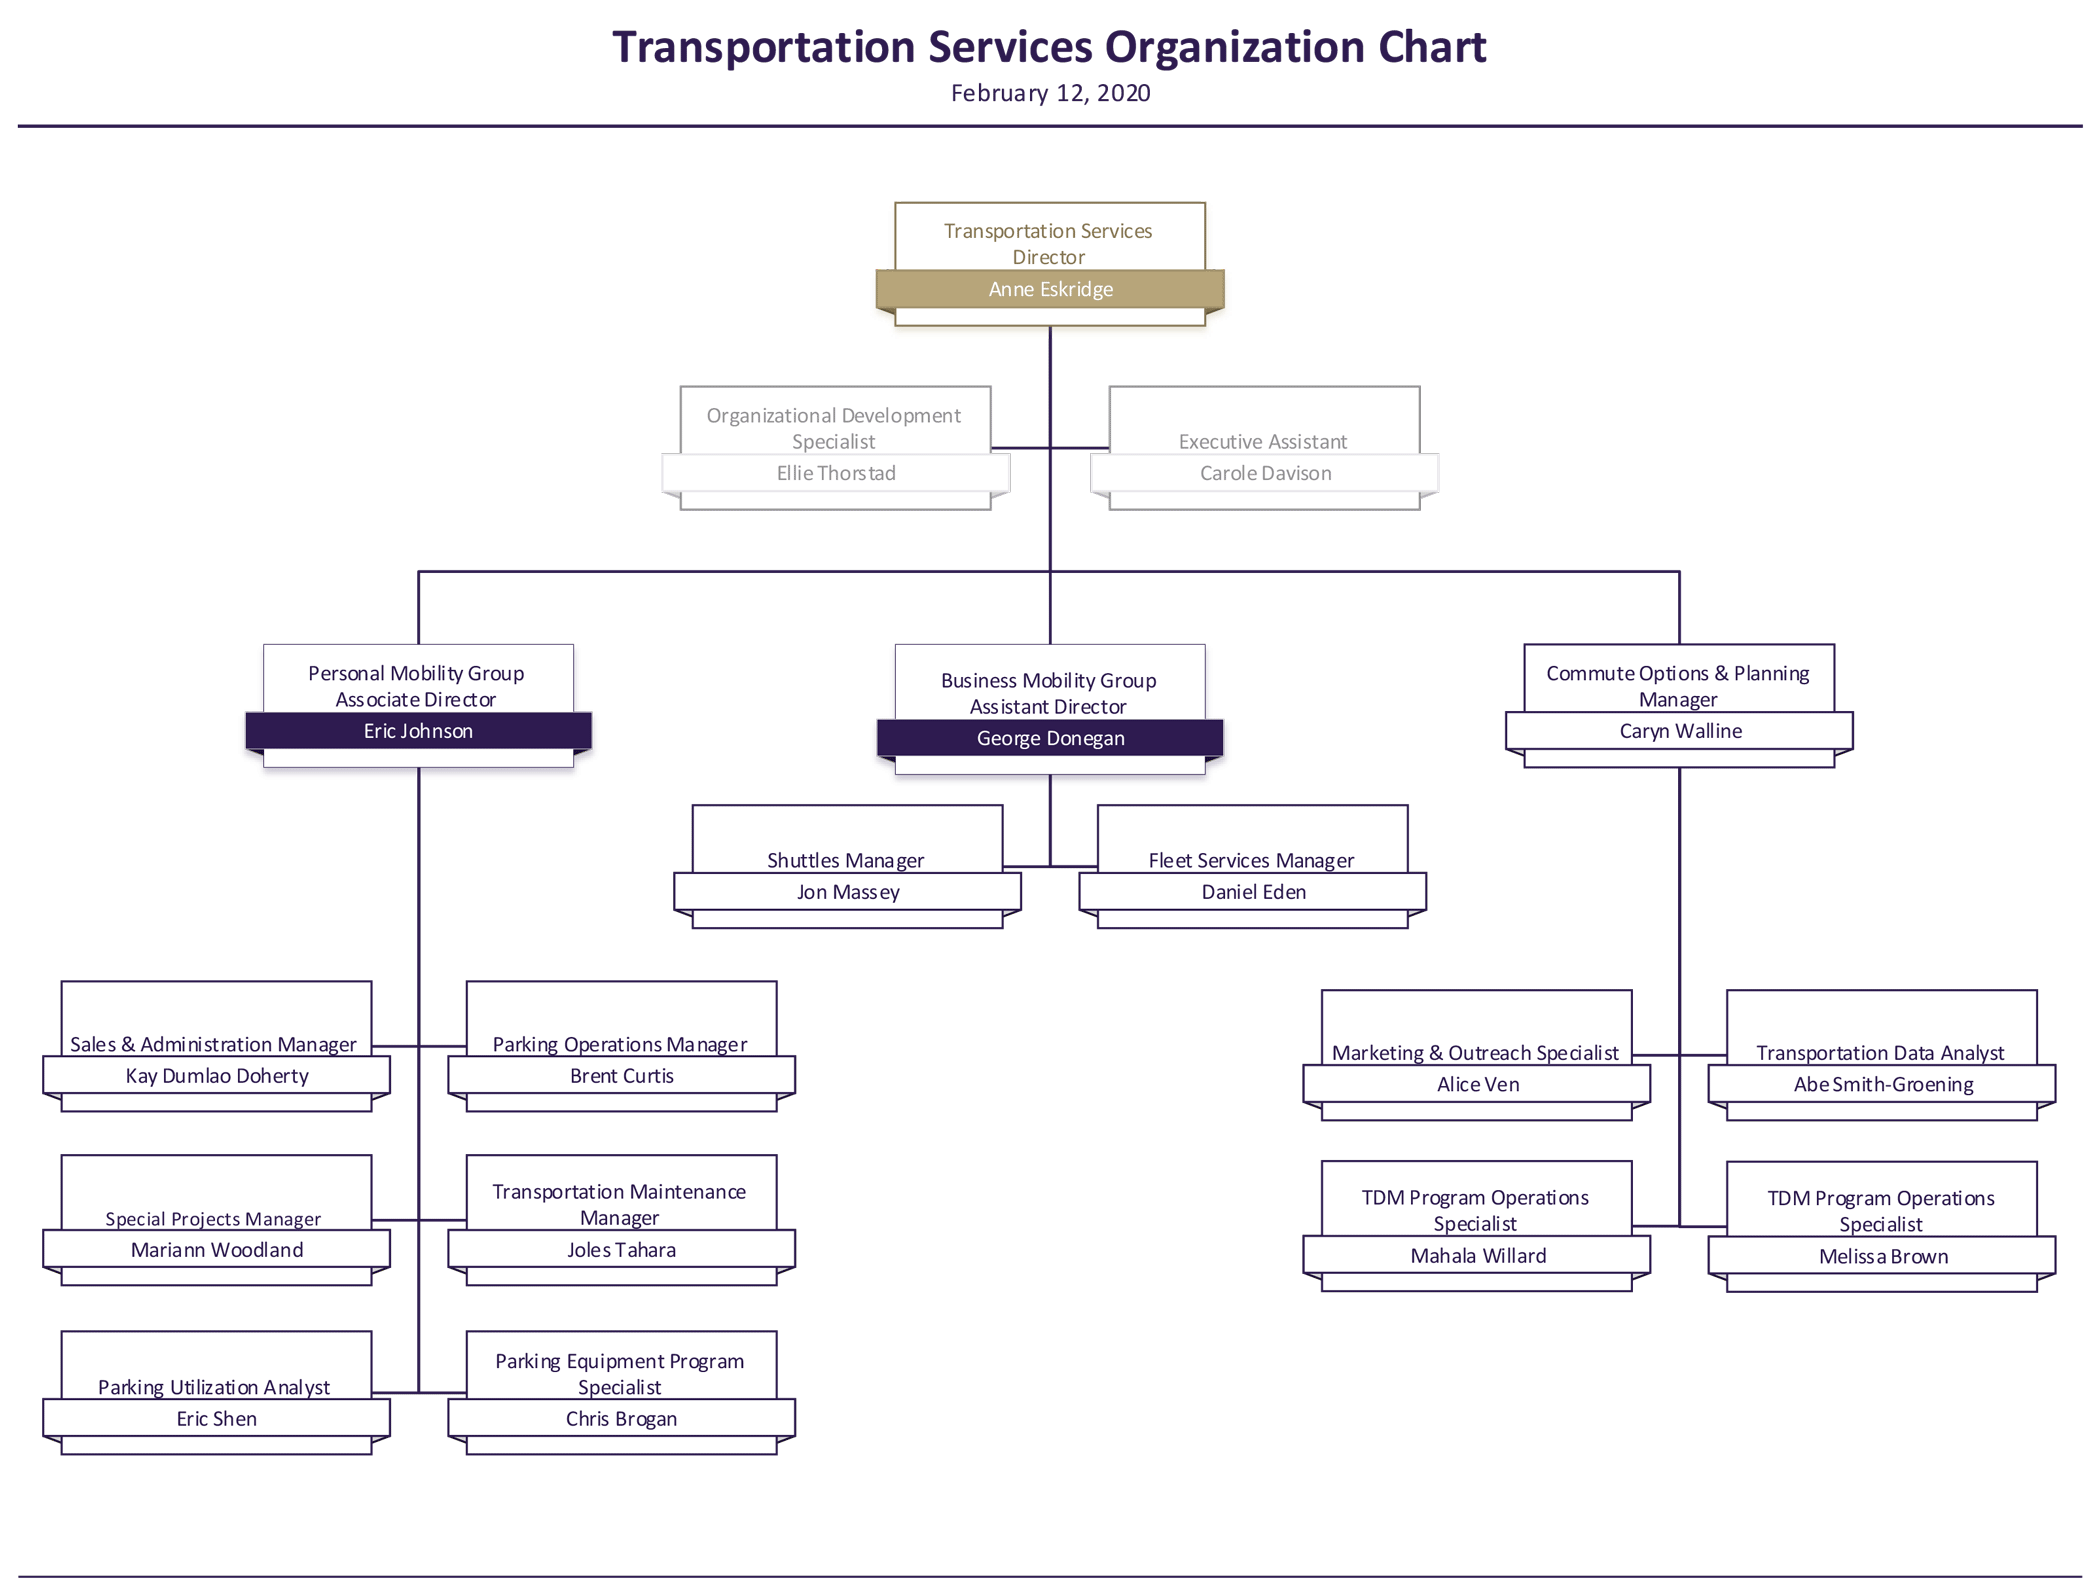 Transportation Services Organization Chart